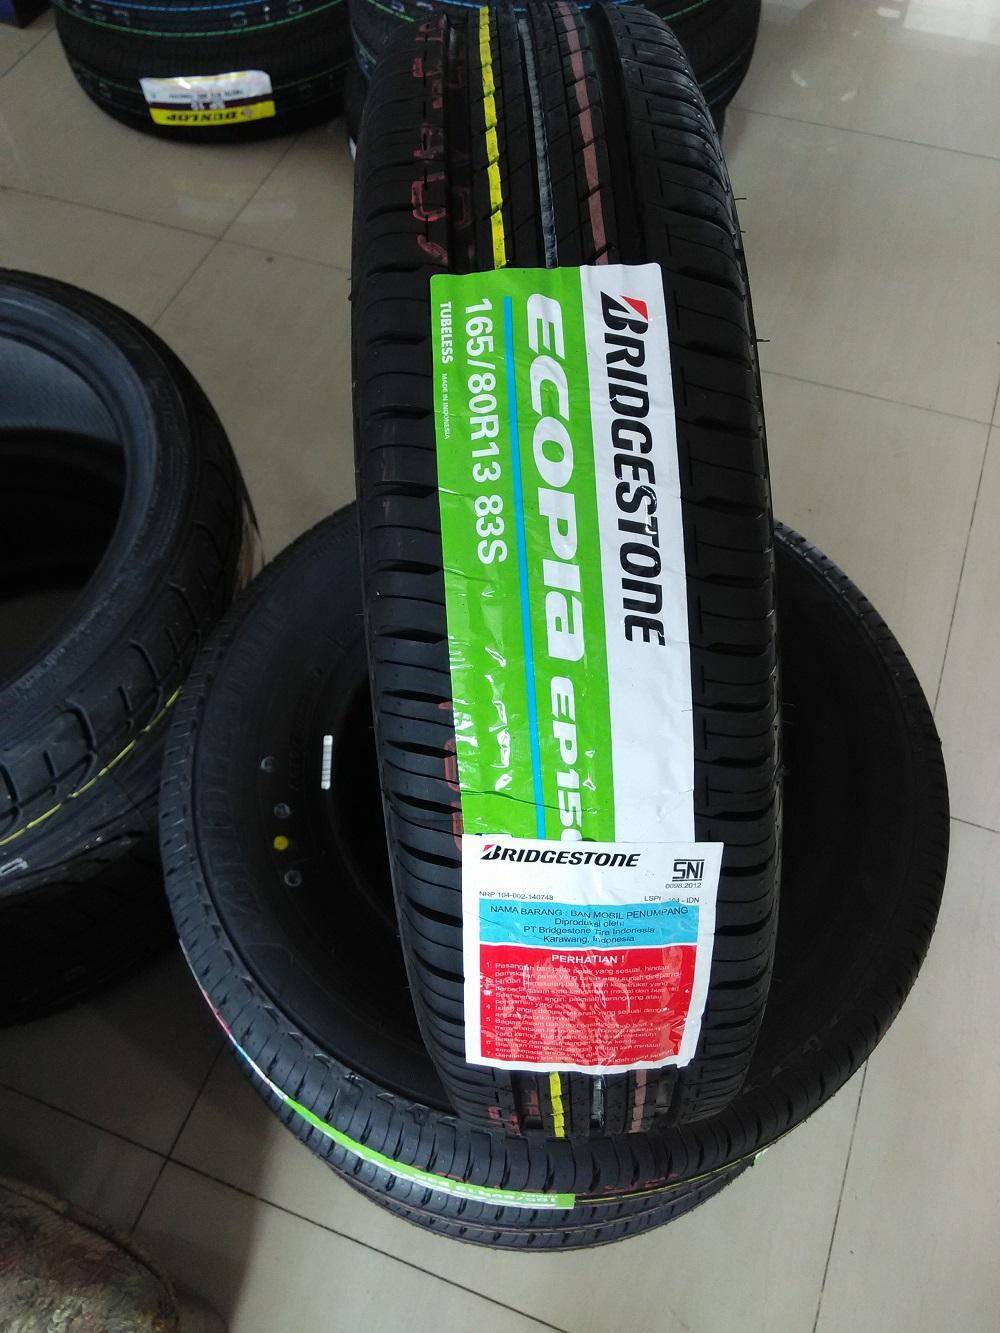 Kelebihan Bridgestone Ecopia Ep150 165 80 R13 Ban Mobil Terkini Turanza Ar20 195 65 R15 Vocer